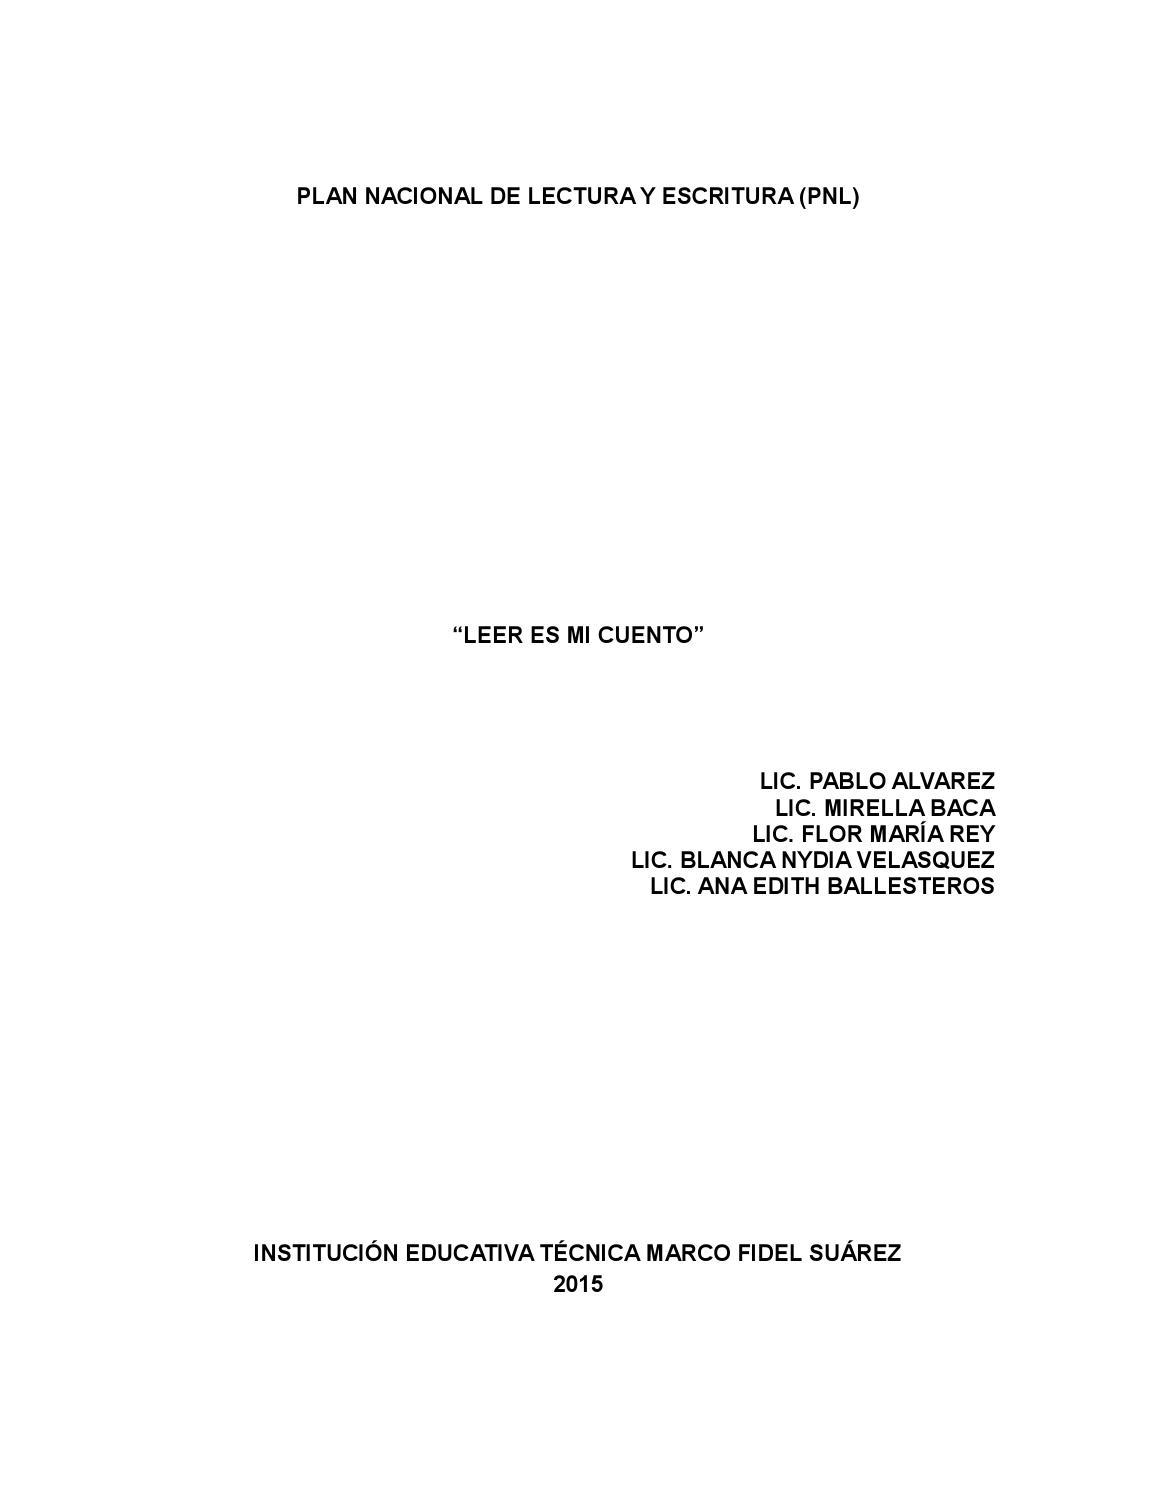 Proyecto pnl 2015 by Marco Fidel Suárez Villavicencio - issuu